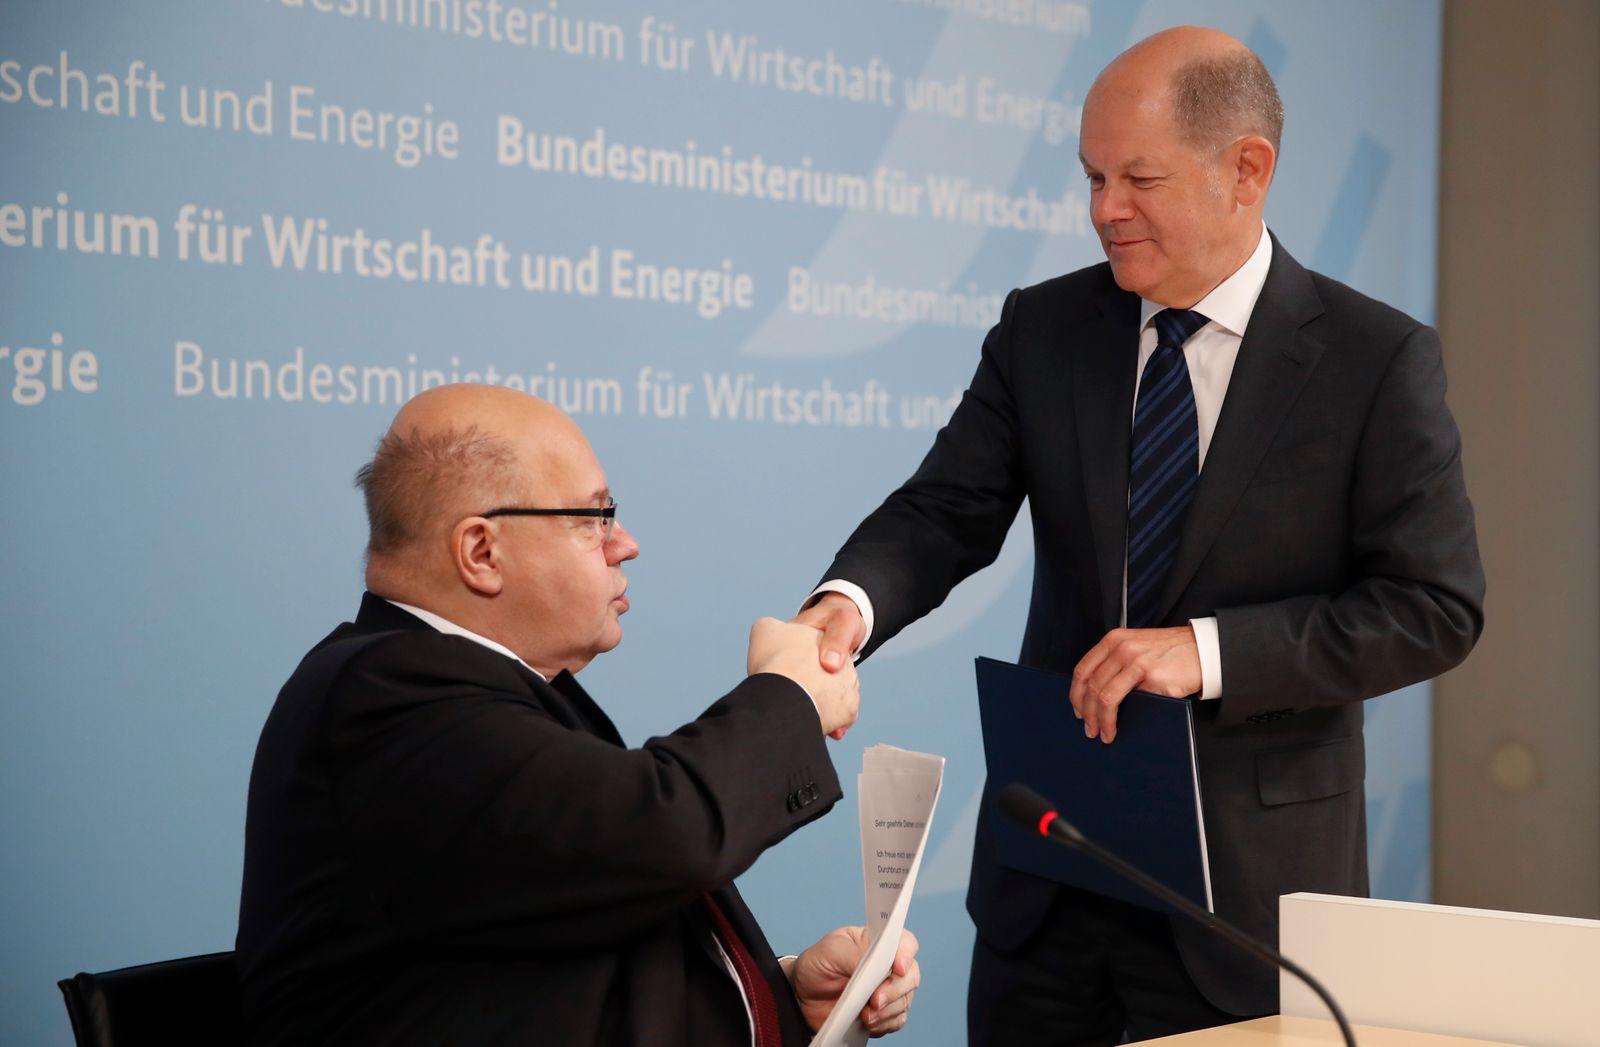 GERMANY-POLITICS-ENVIRONMENT-ENERGY-COAL